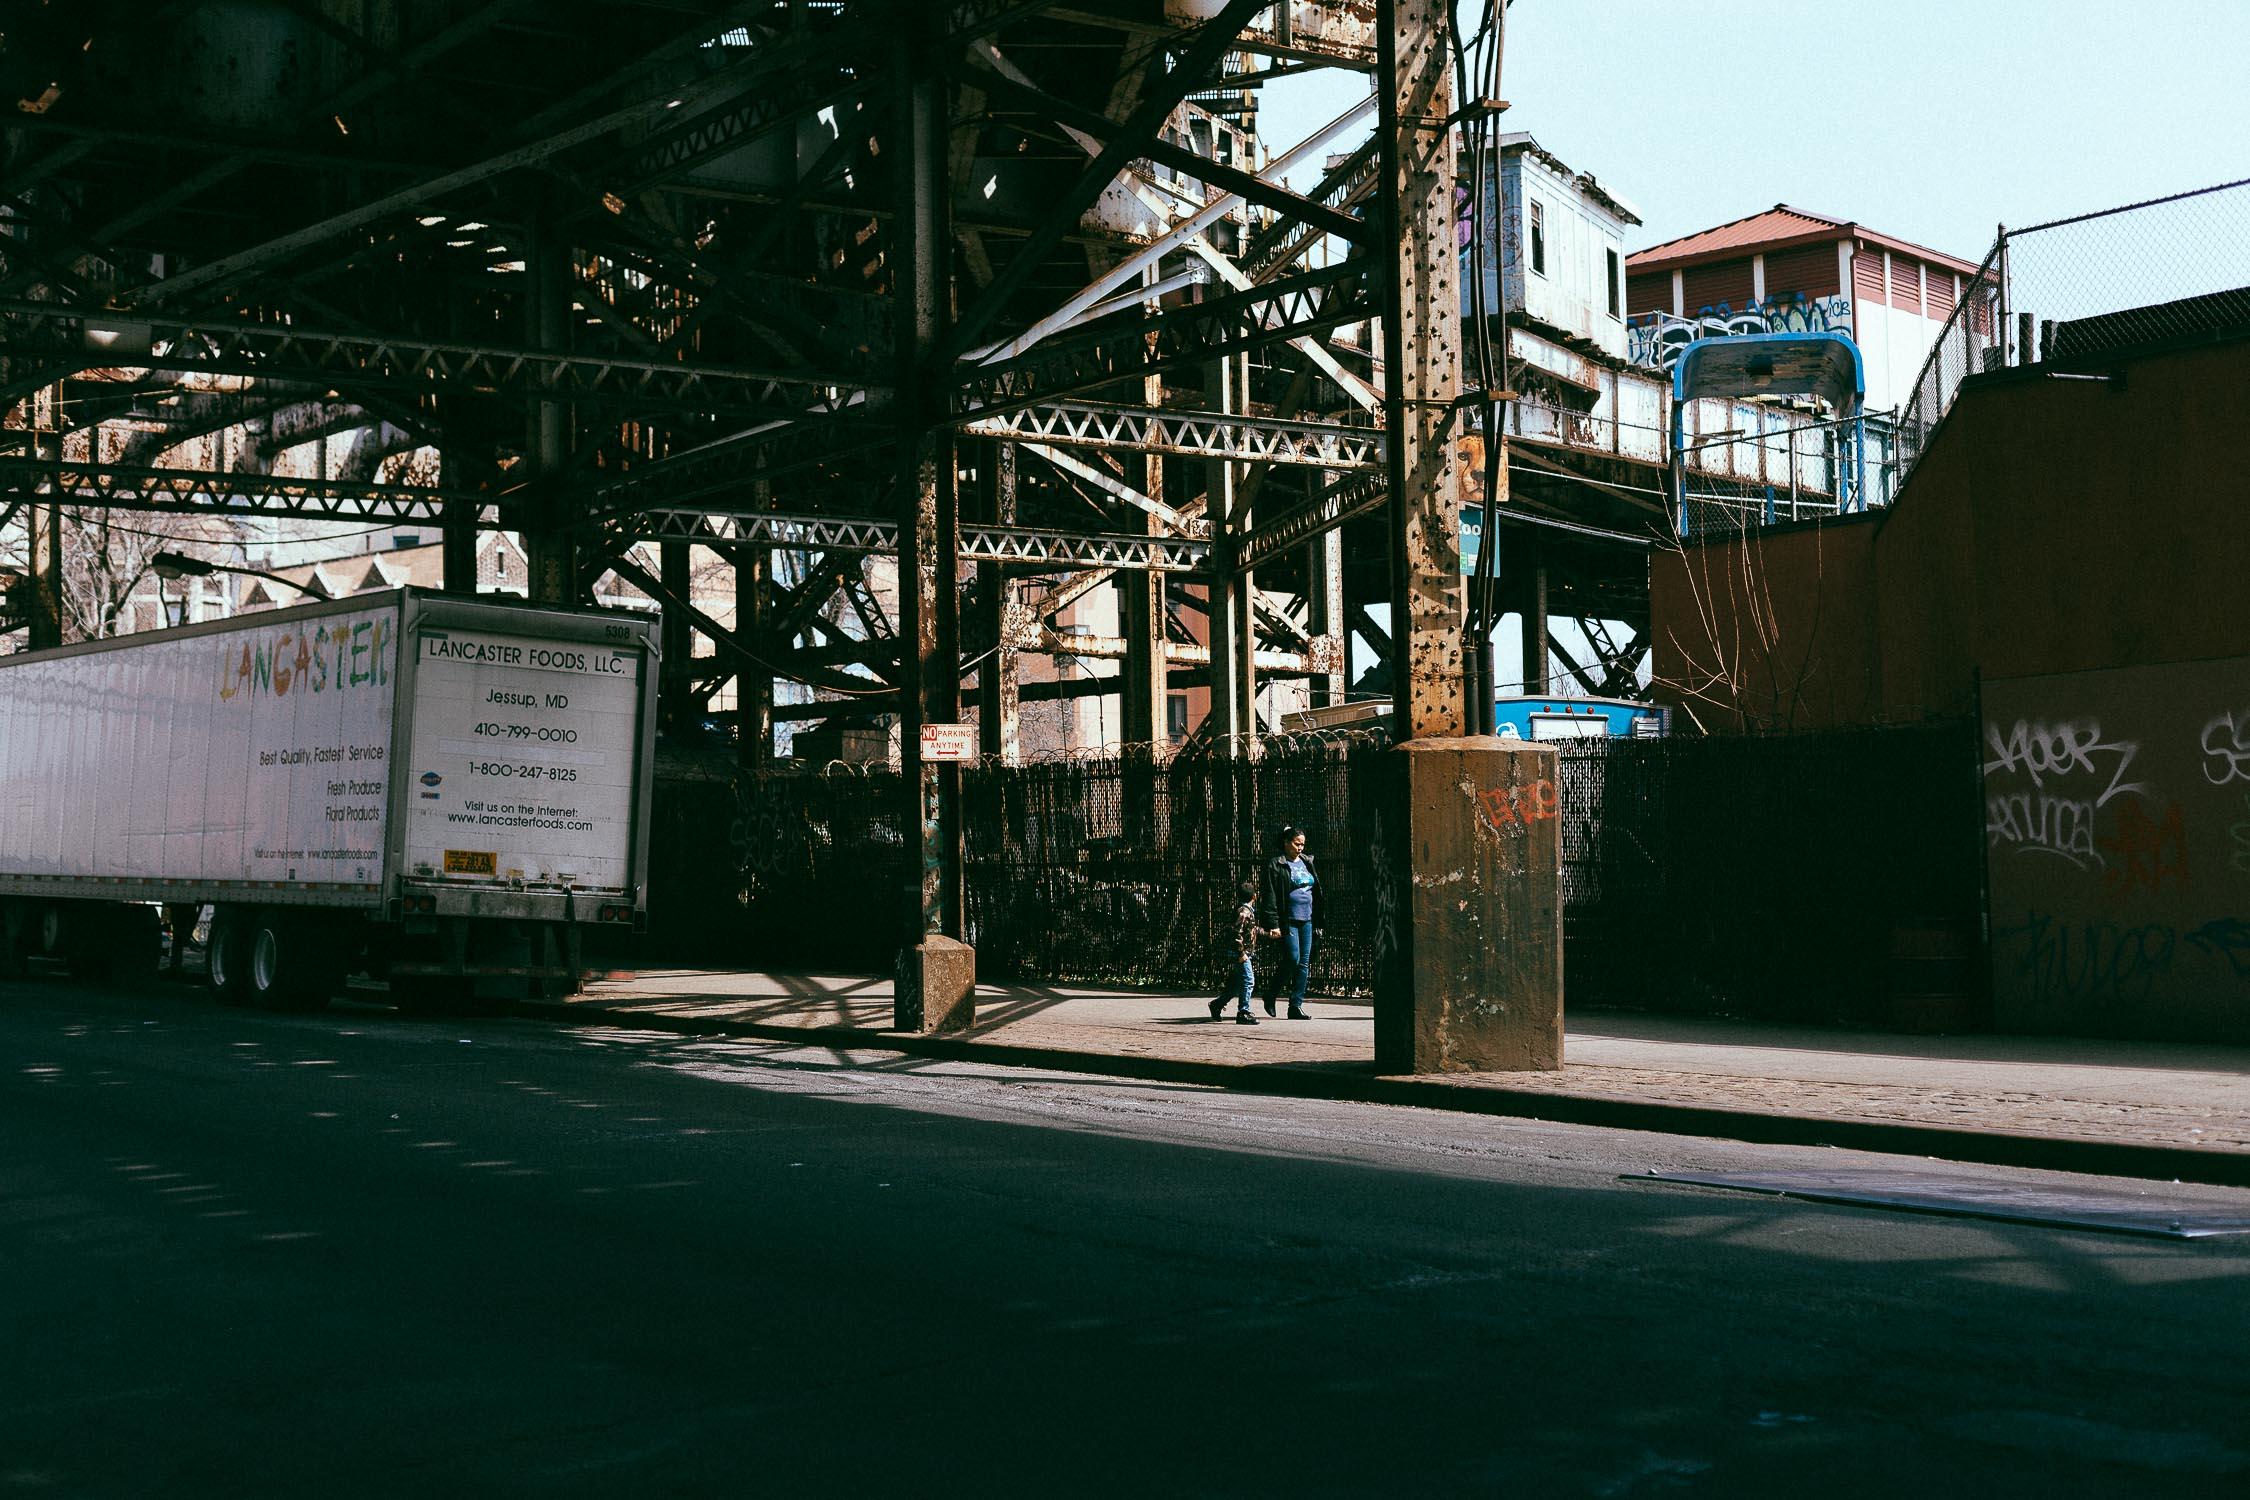 bronx new york subway station street photography